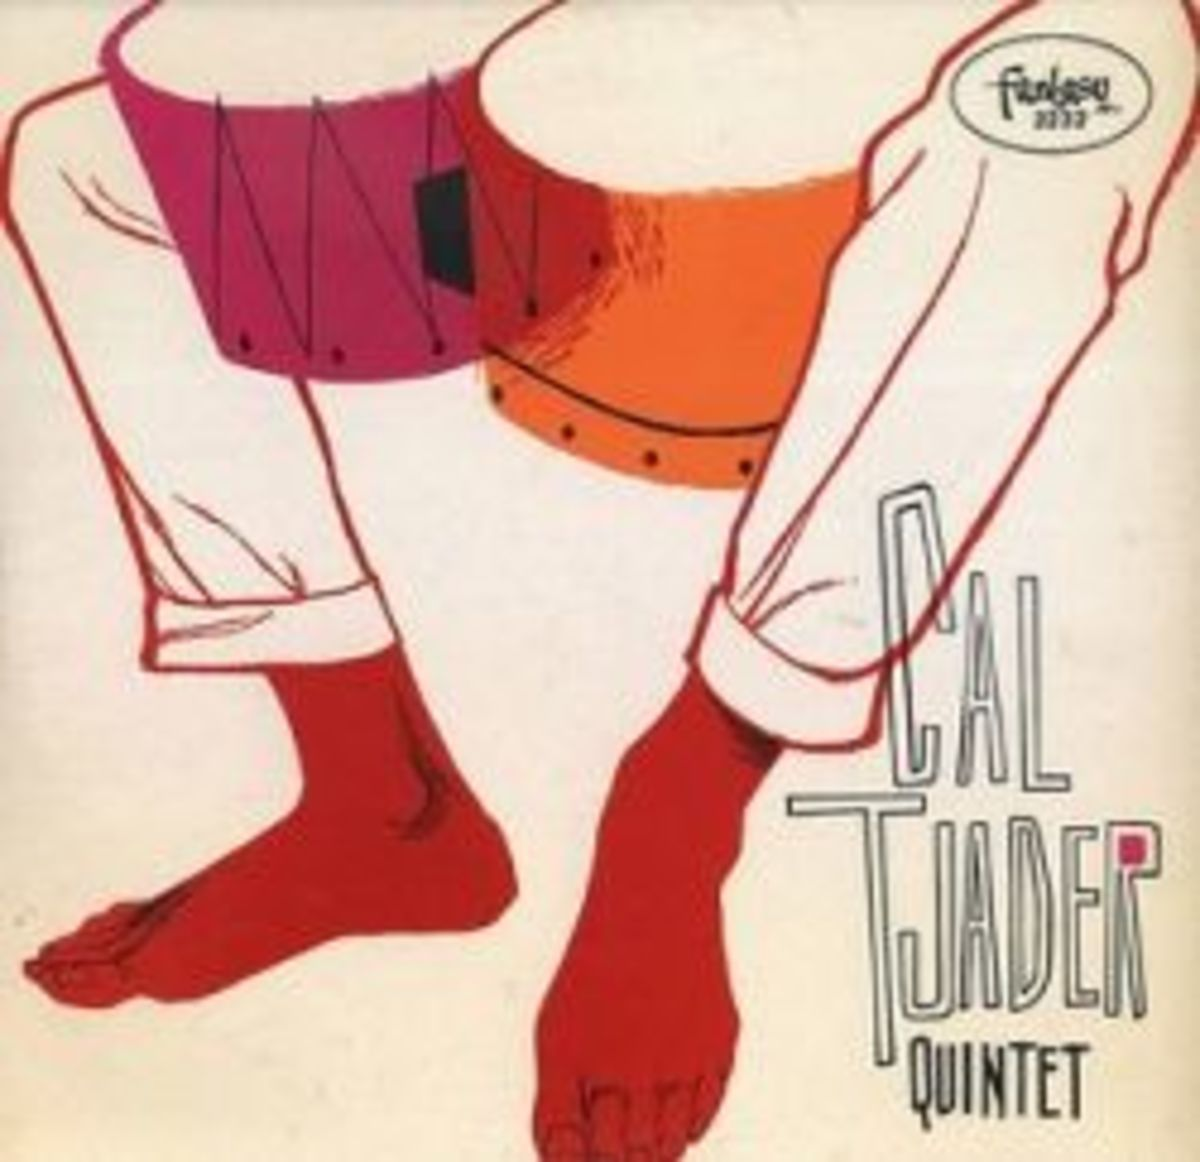 "Cal Tjader Quintet ""Cal Tjader Quintet"" Fantasy Records 3232 12"" LP Red Vinyl Record US Pressing (1956)"